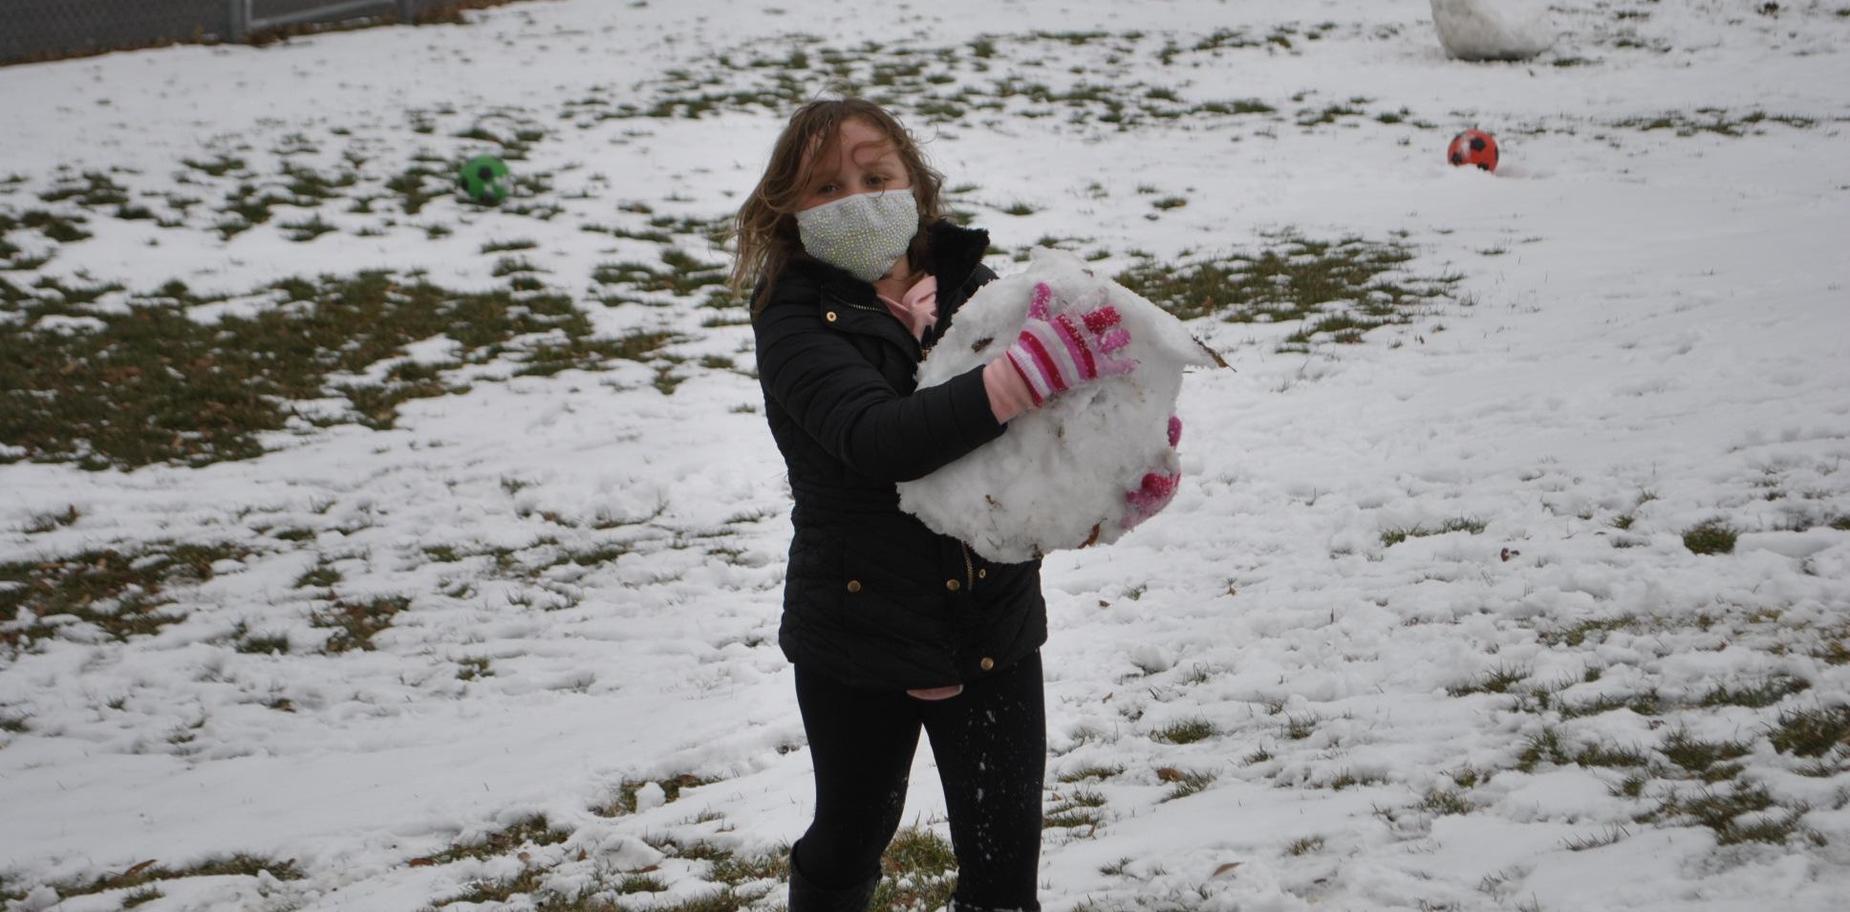 girl carrying snow ball